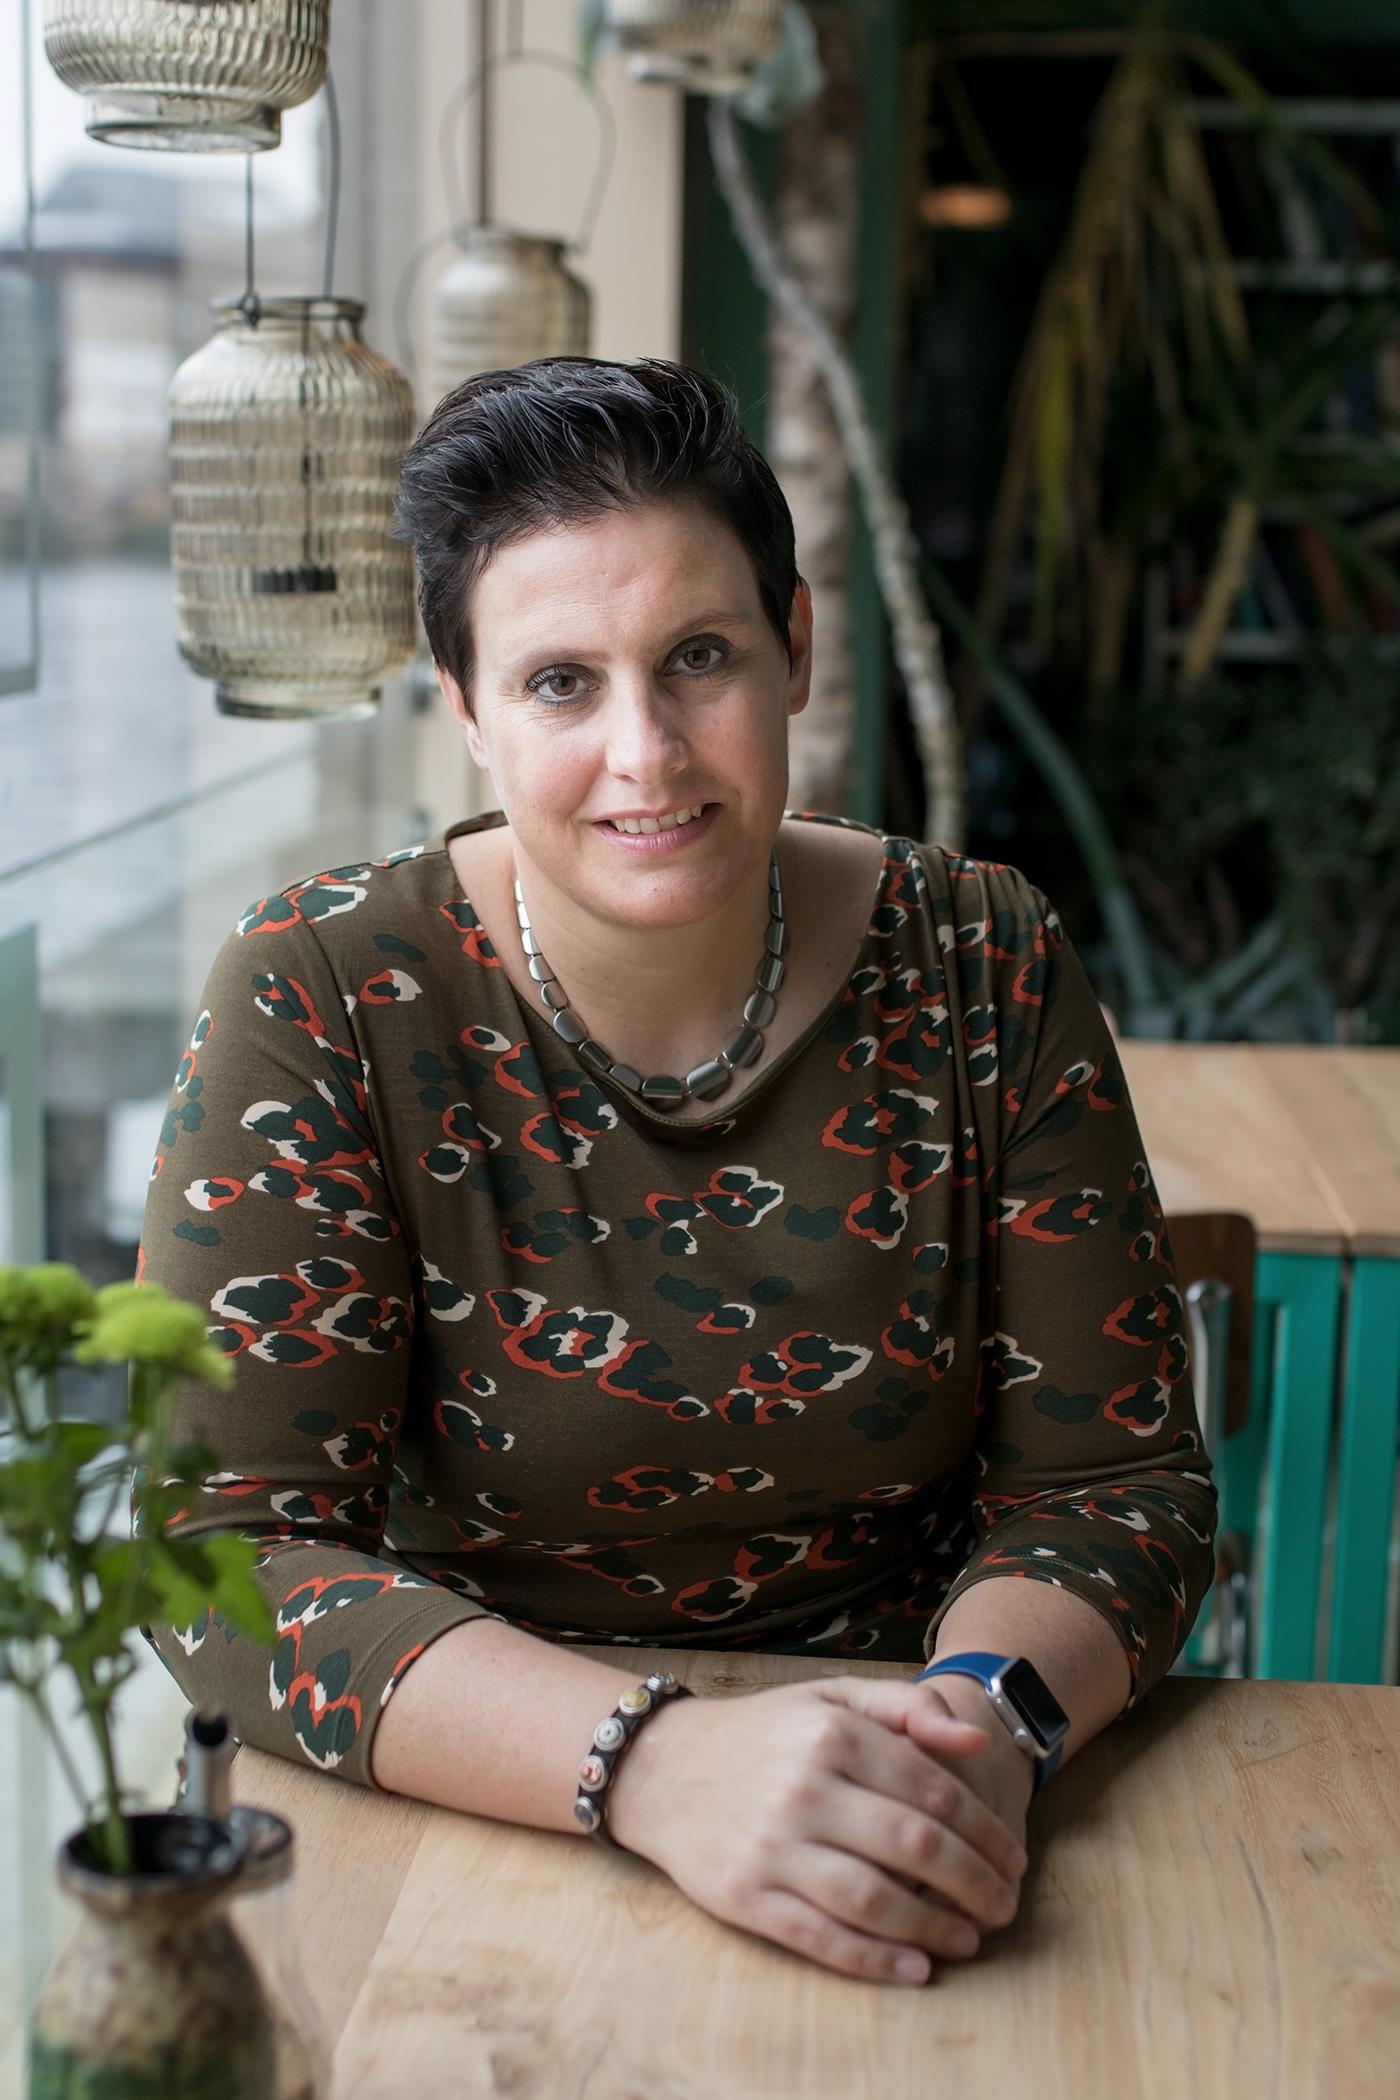 Bravery at work, Astrid van der Laan, Bedrijfsadvies.